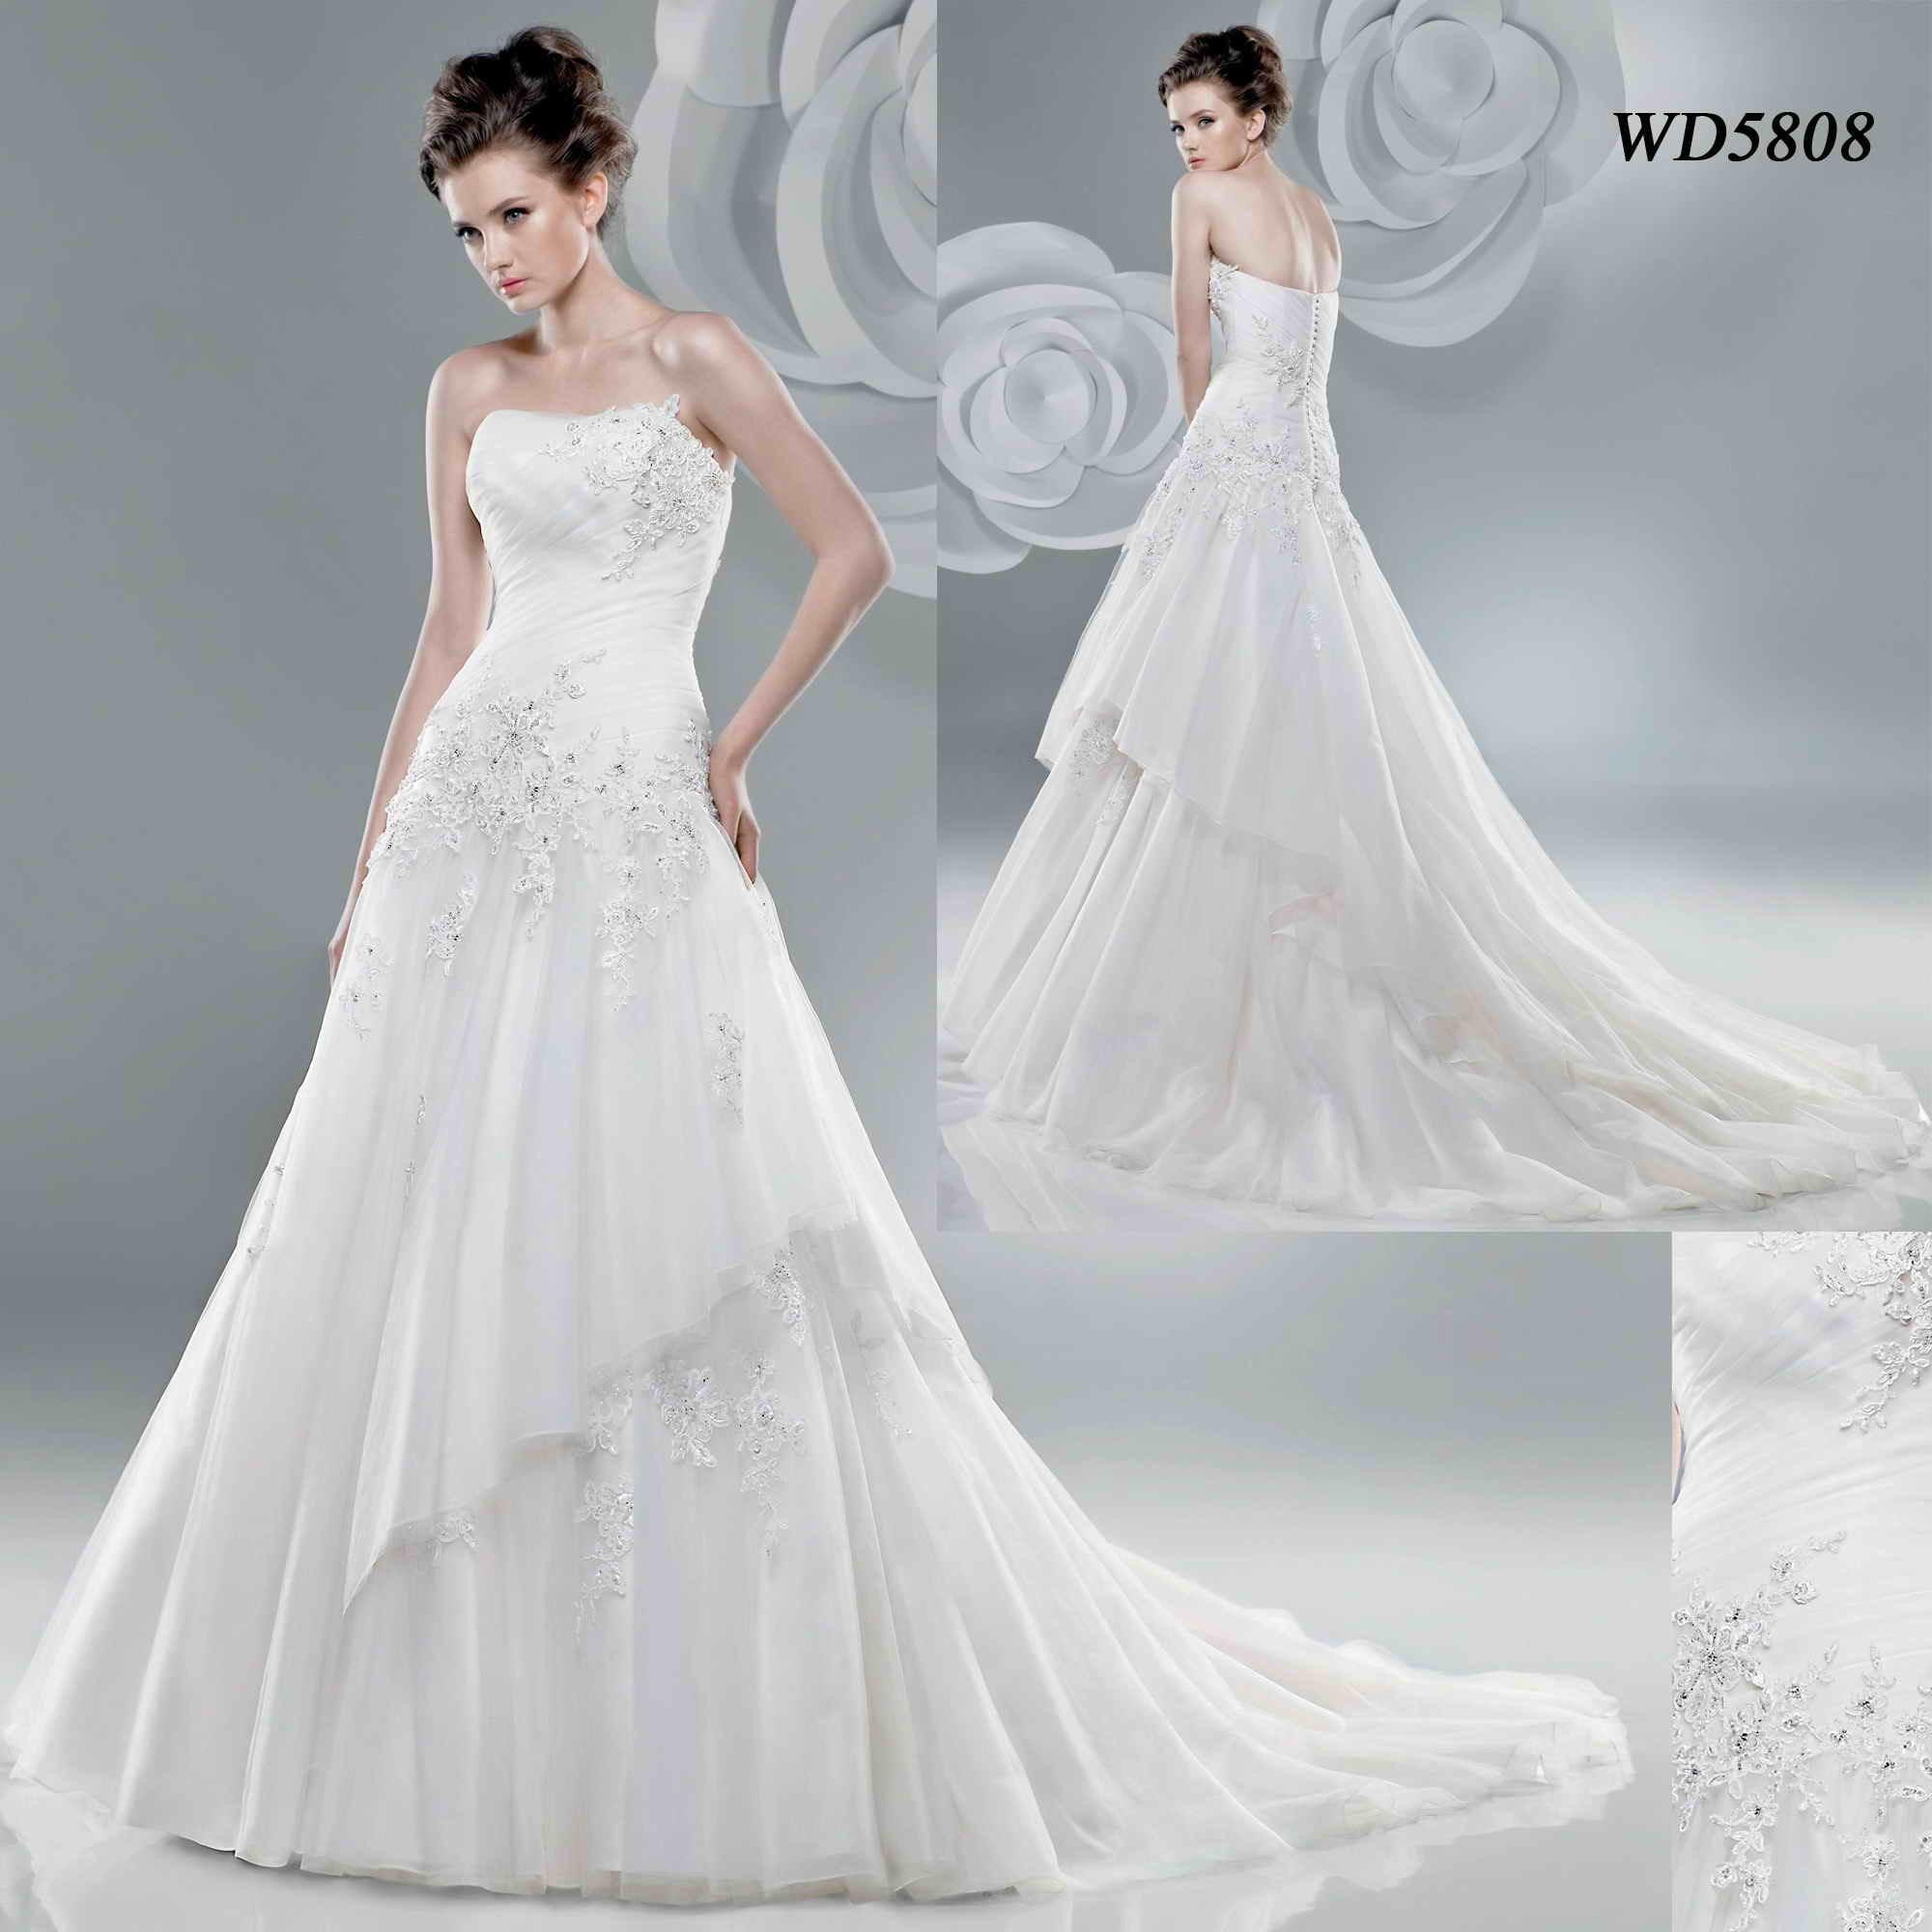 Wedding Dress Gown (WD5808)